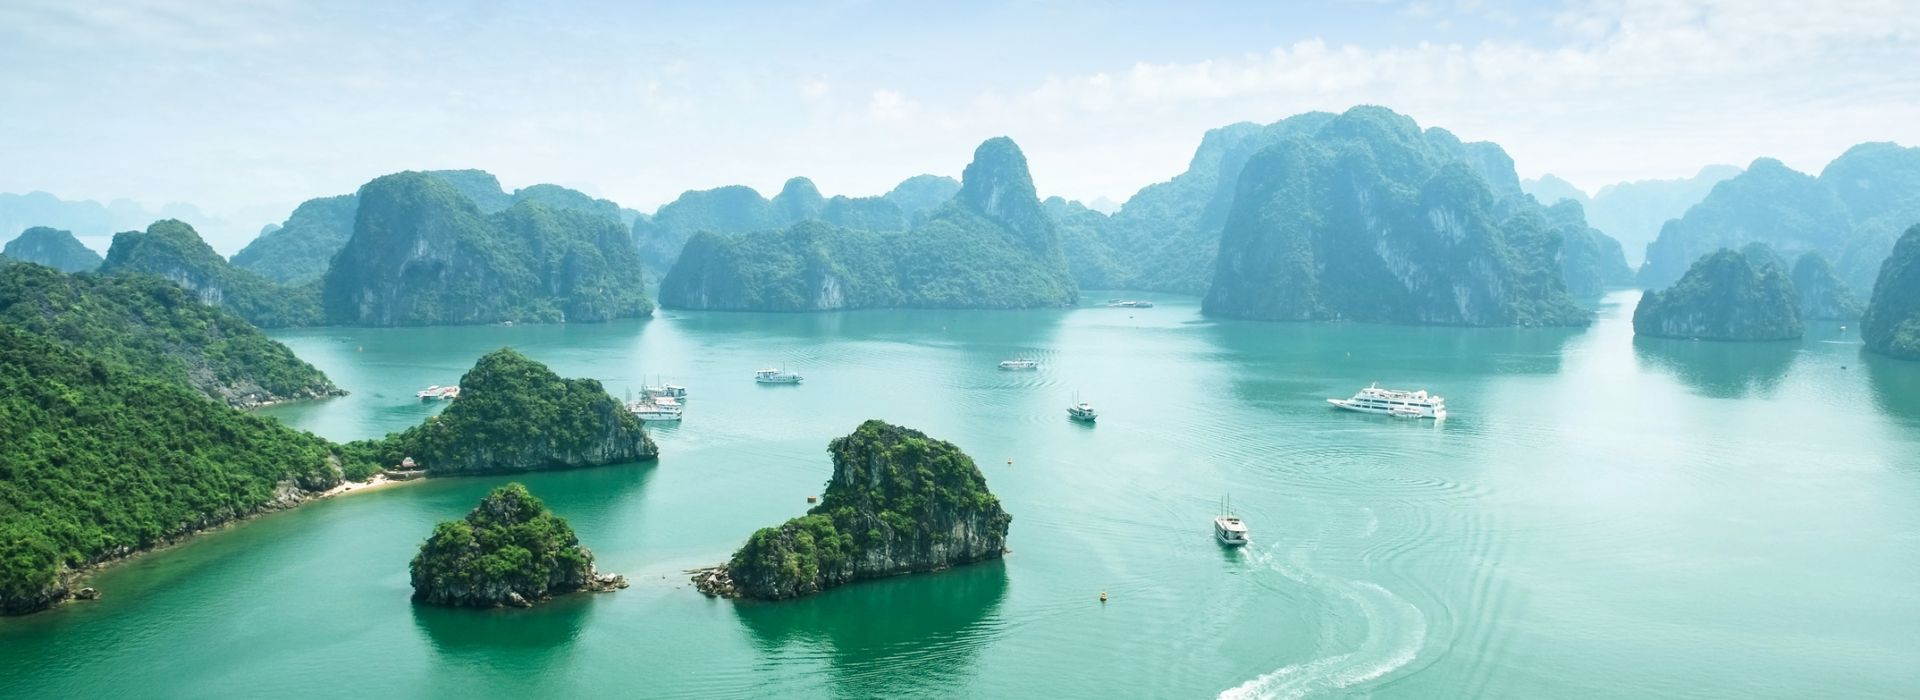 Walking tours in Vietnam